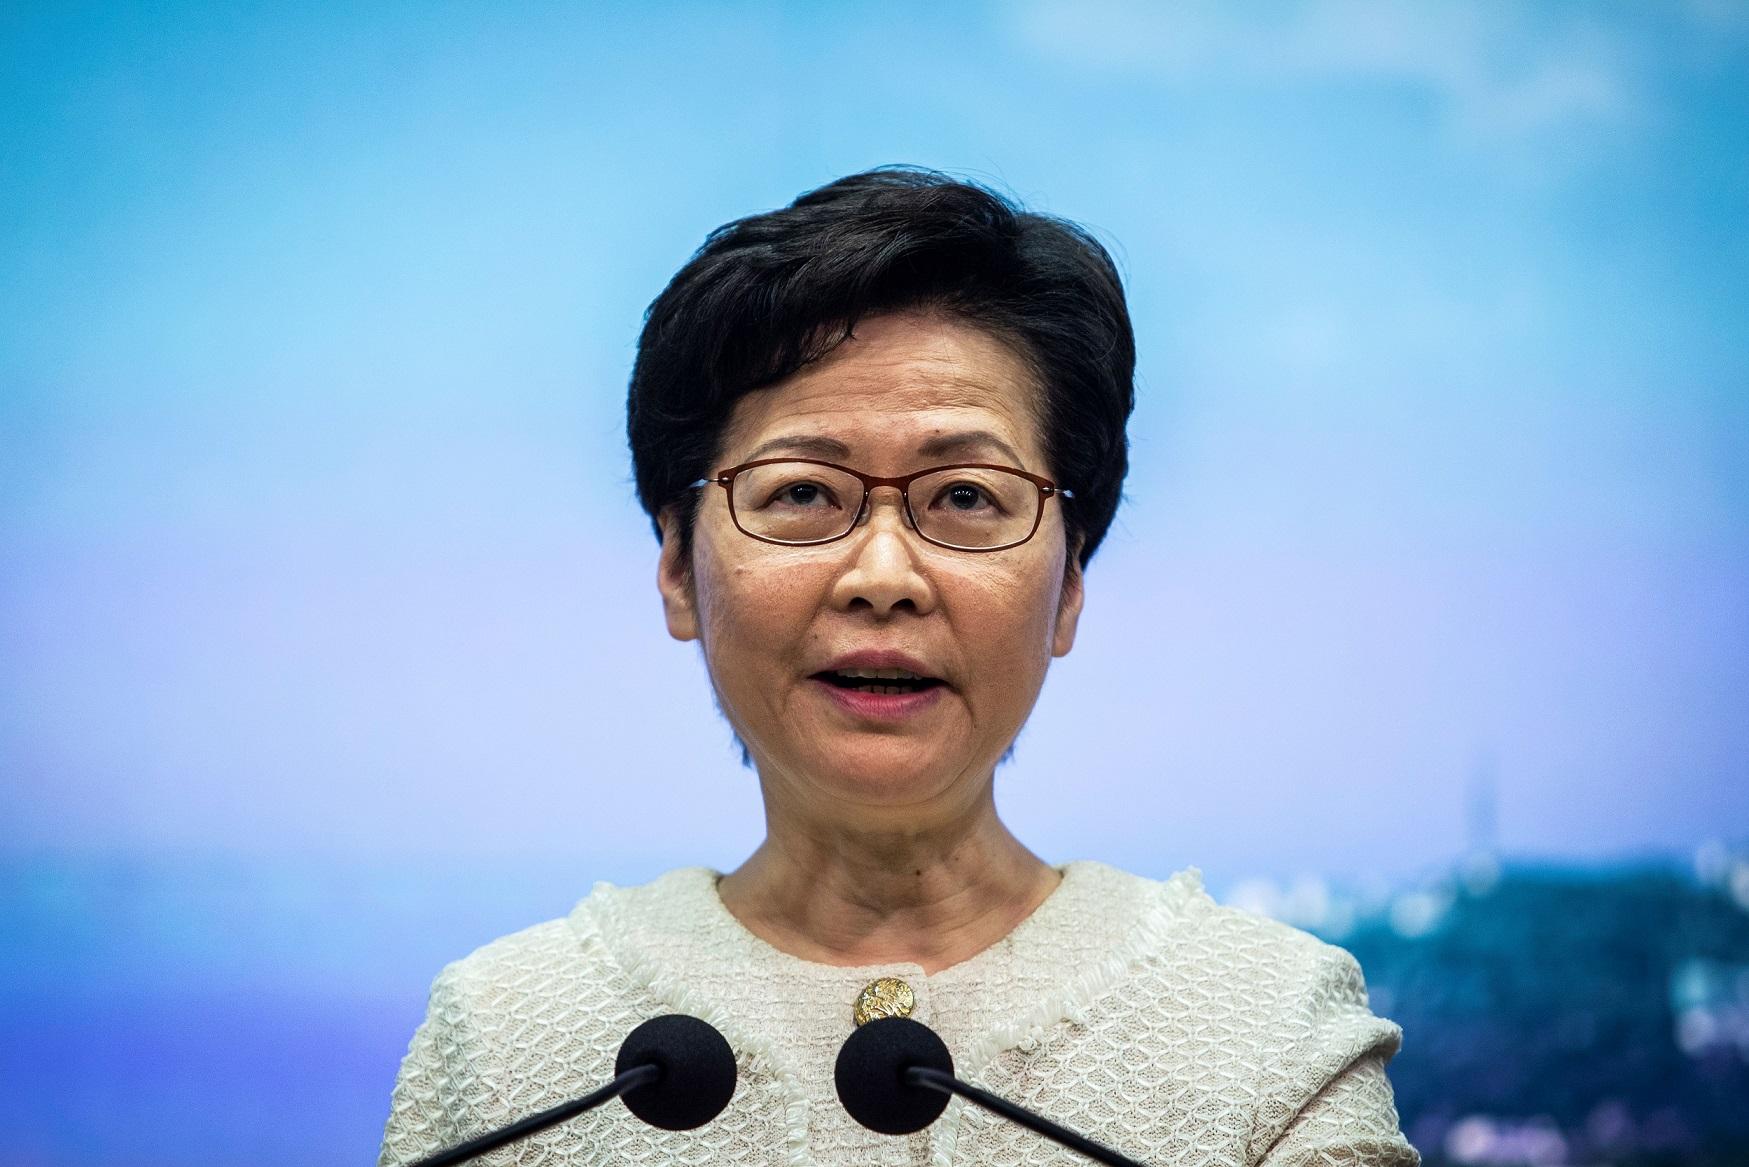 (Chefe do Executivo de Hong Kong, Carrie Lam. Foto: ISAAC LAWRENCE / AFP)